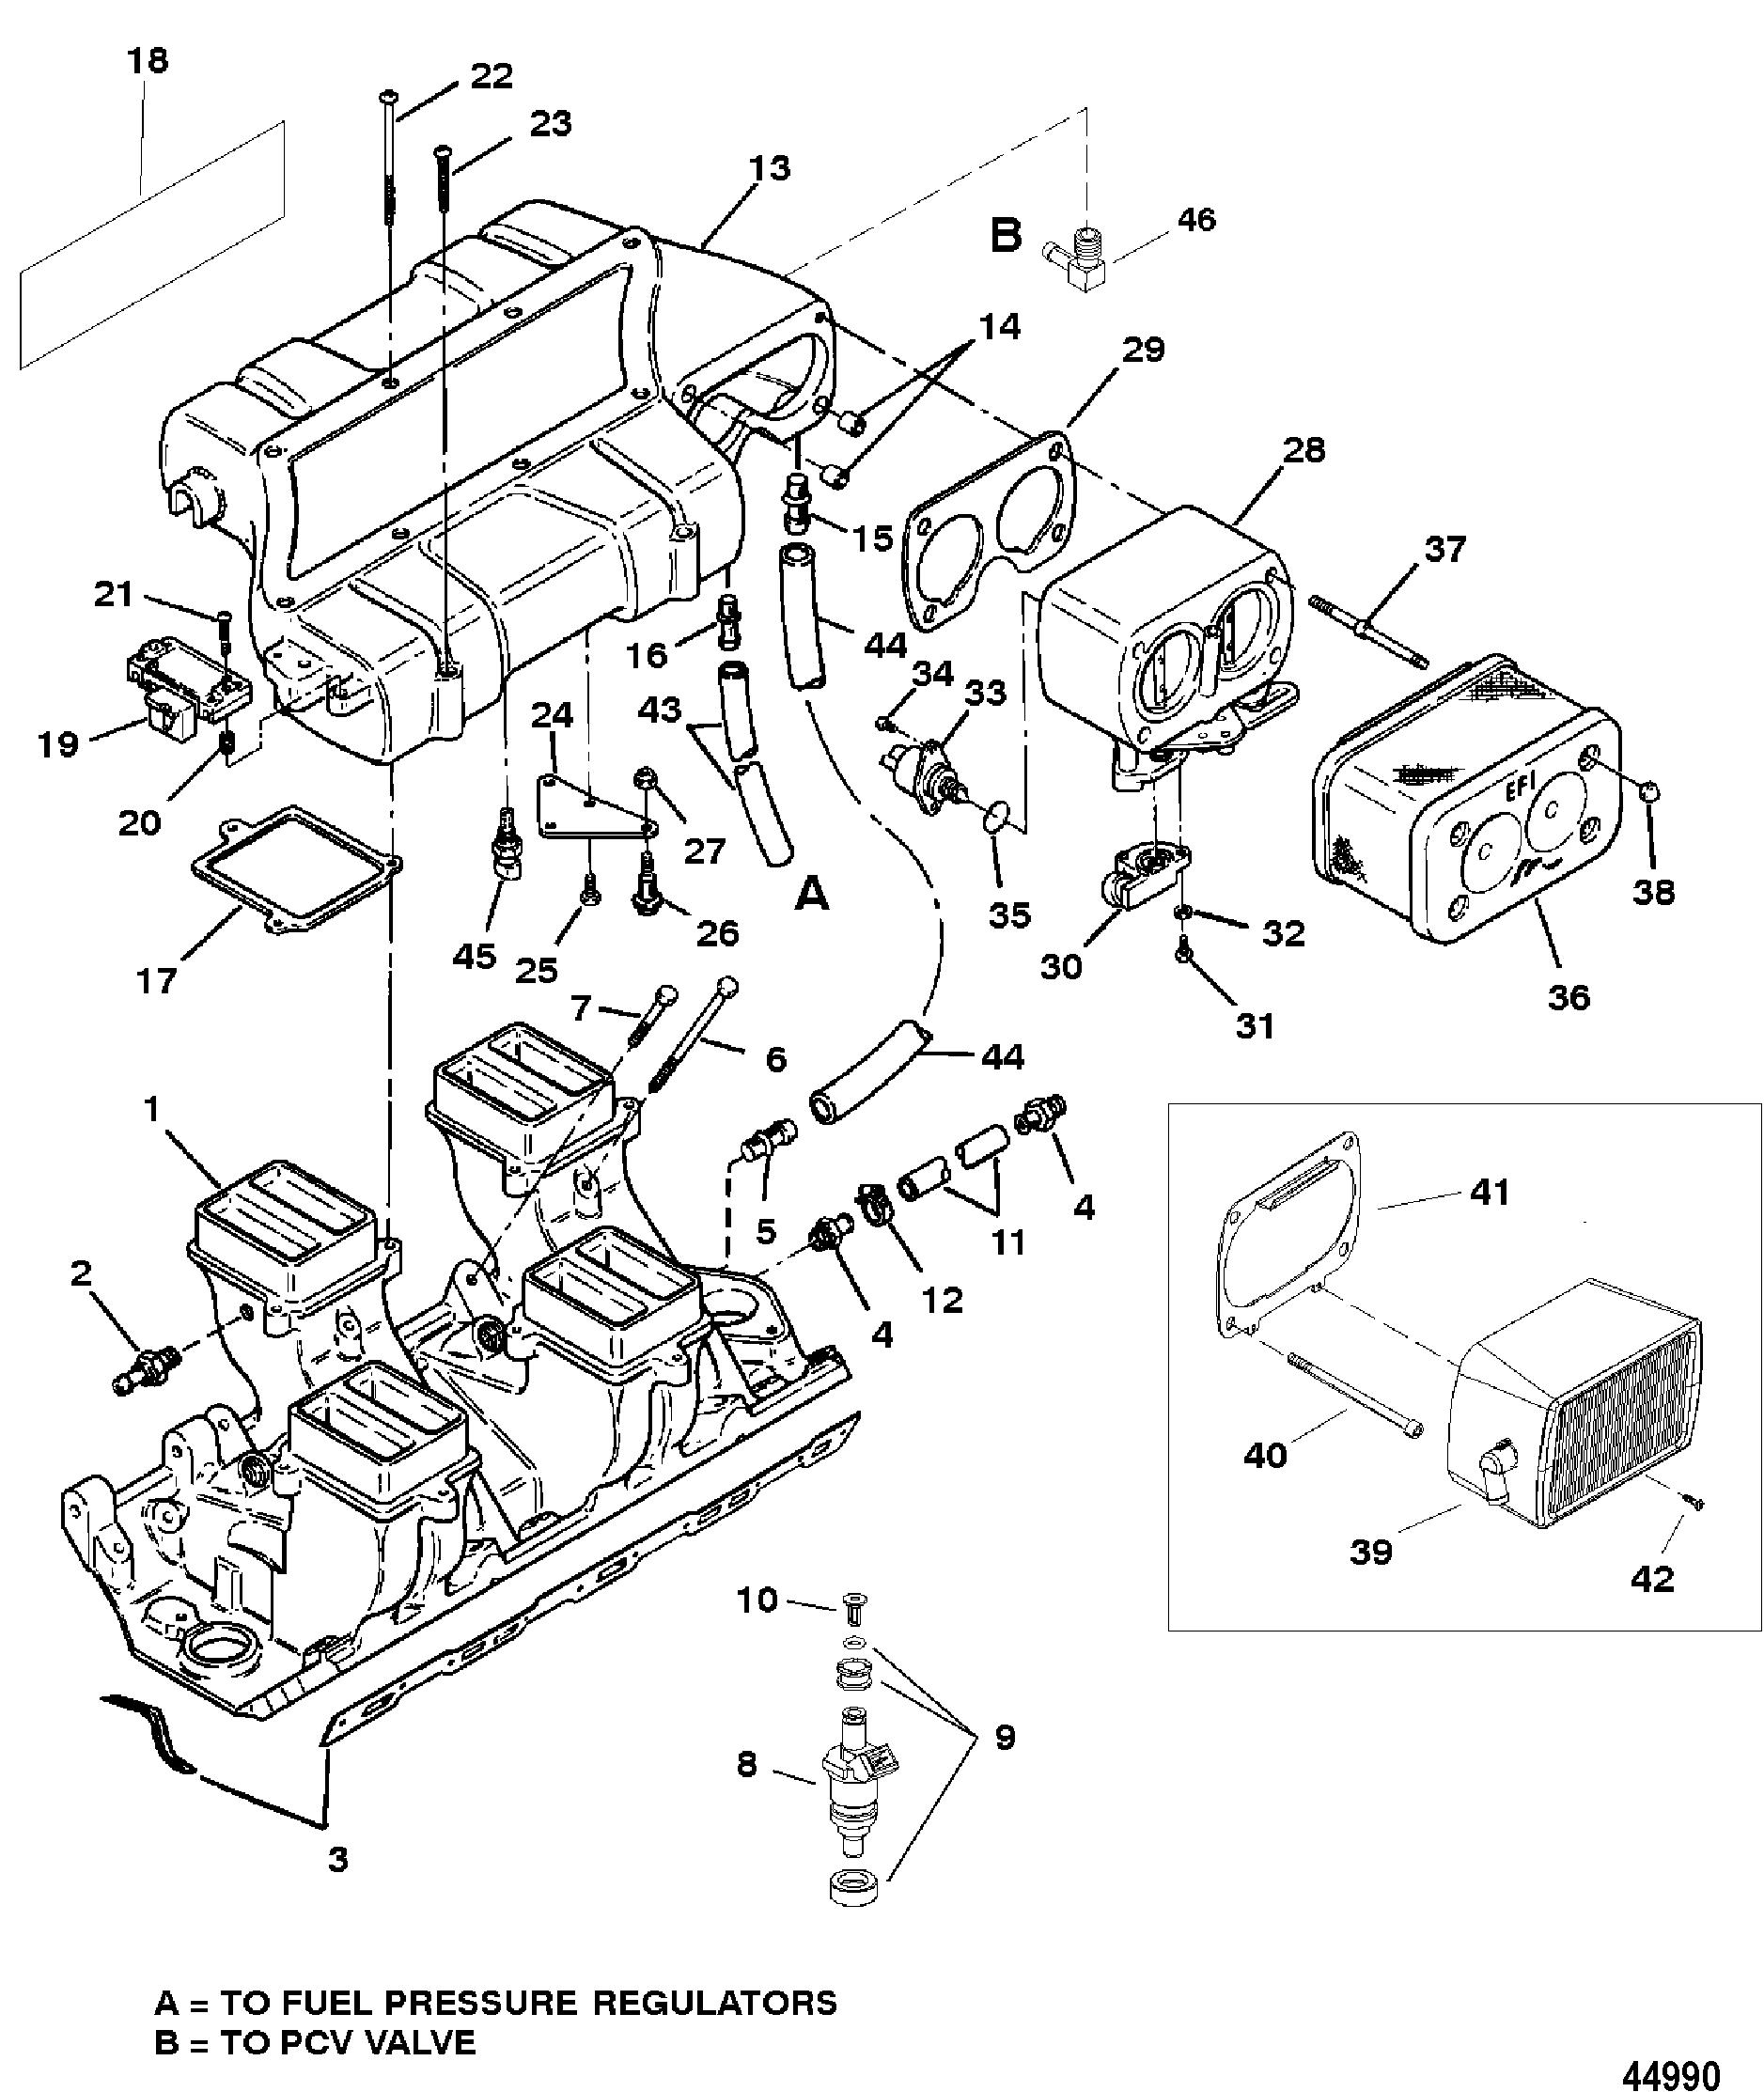 Intake Manifold And Intake Plenum For Mercruiser 7 4 Lx Efi Mpi Bravo Gen Vi